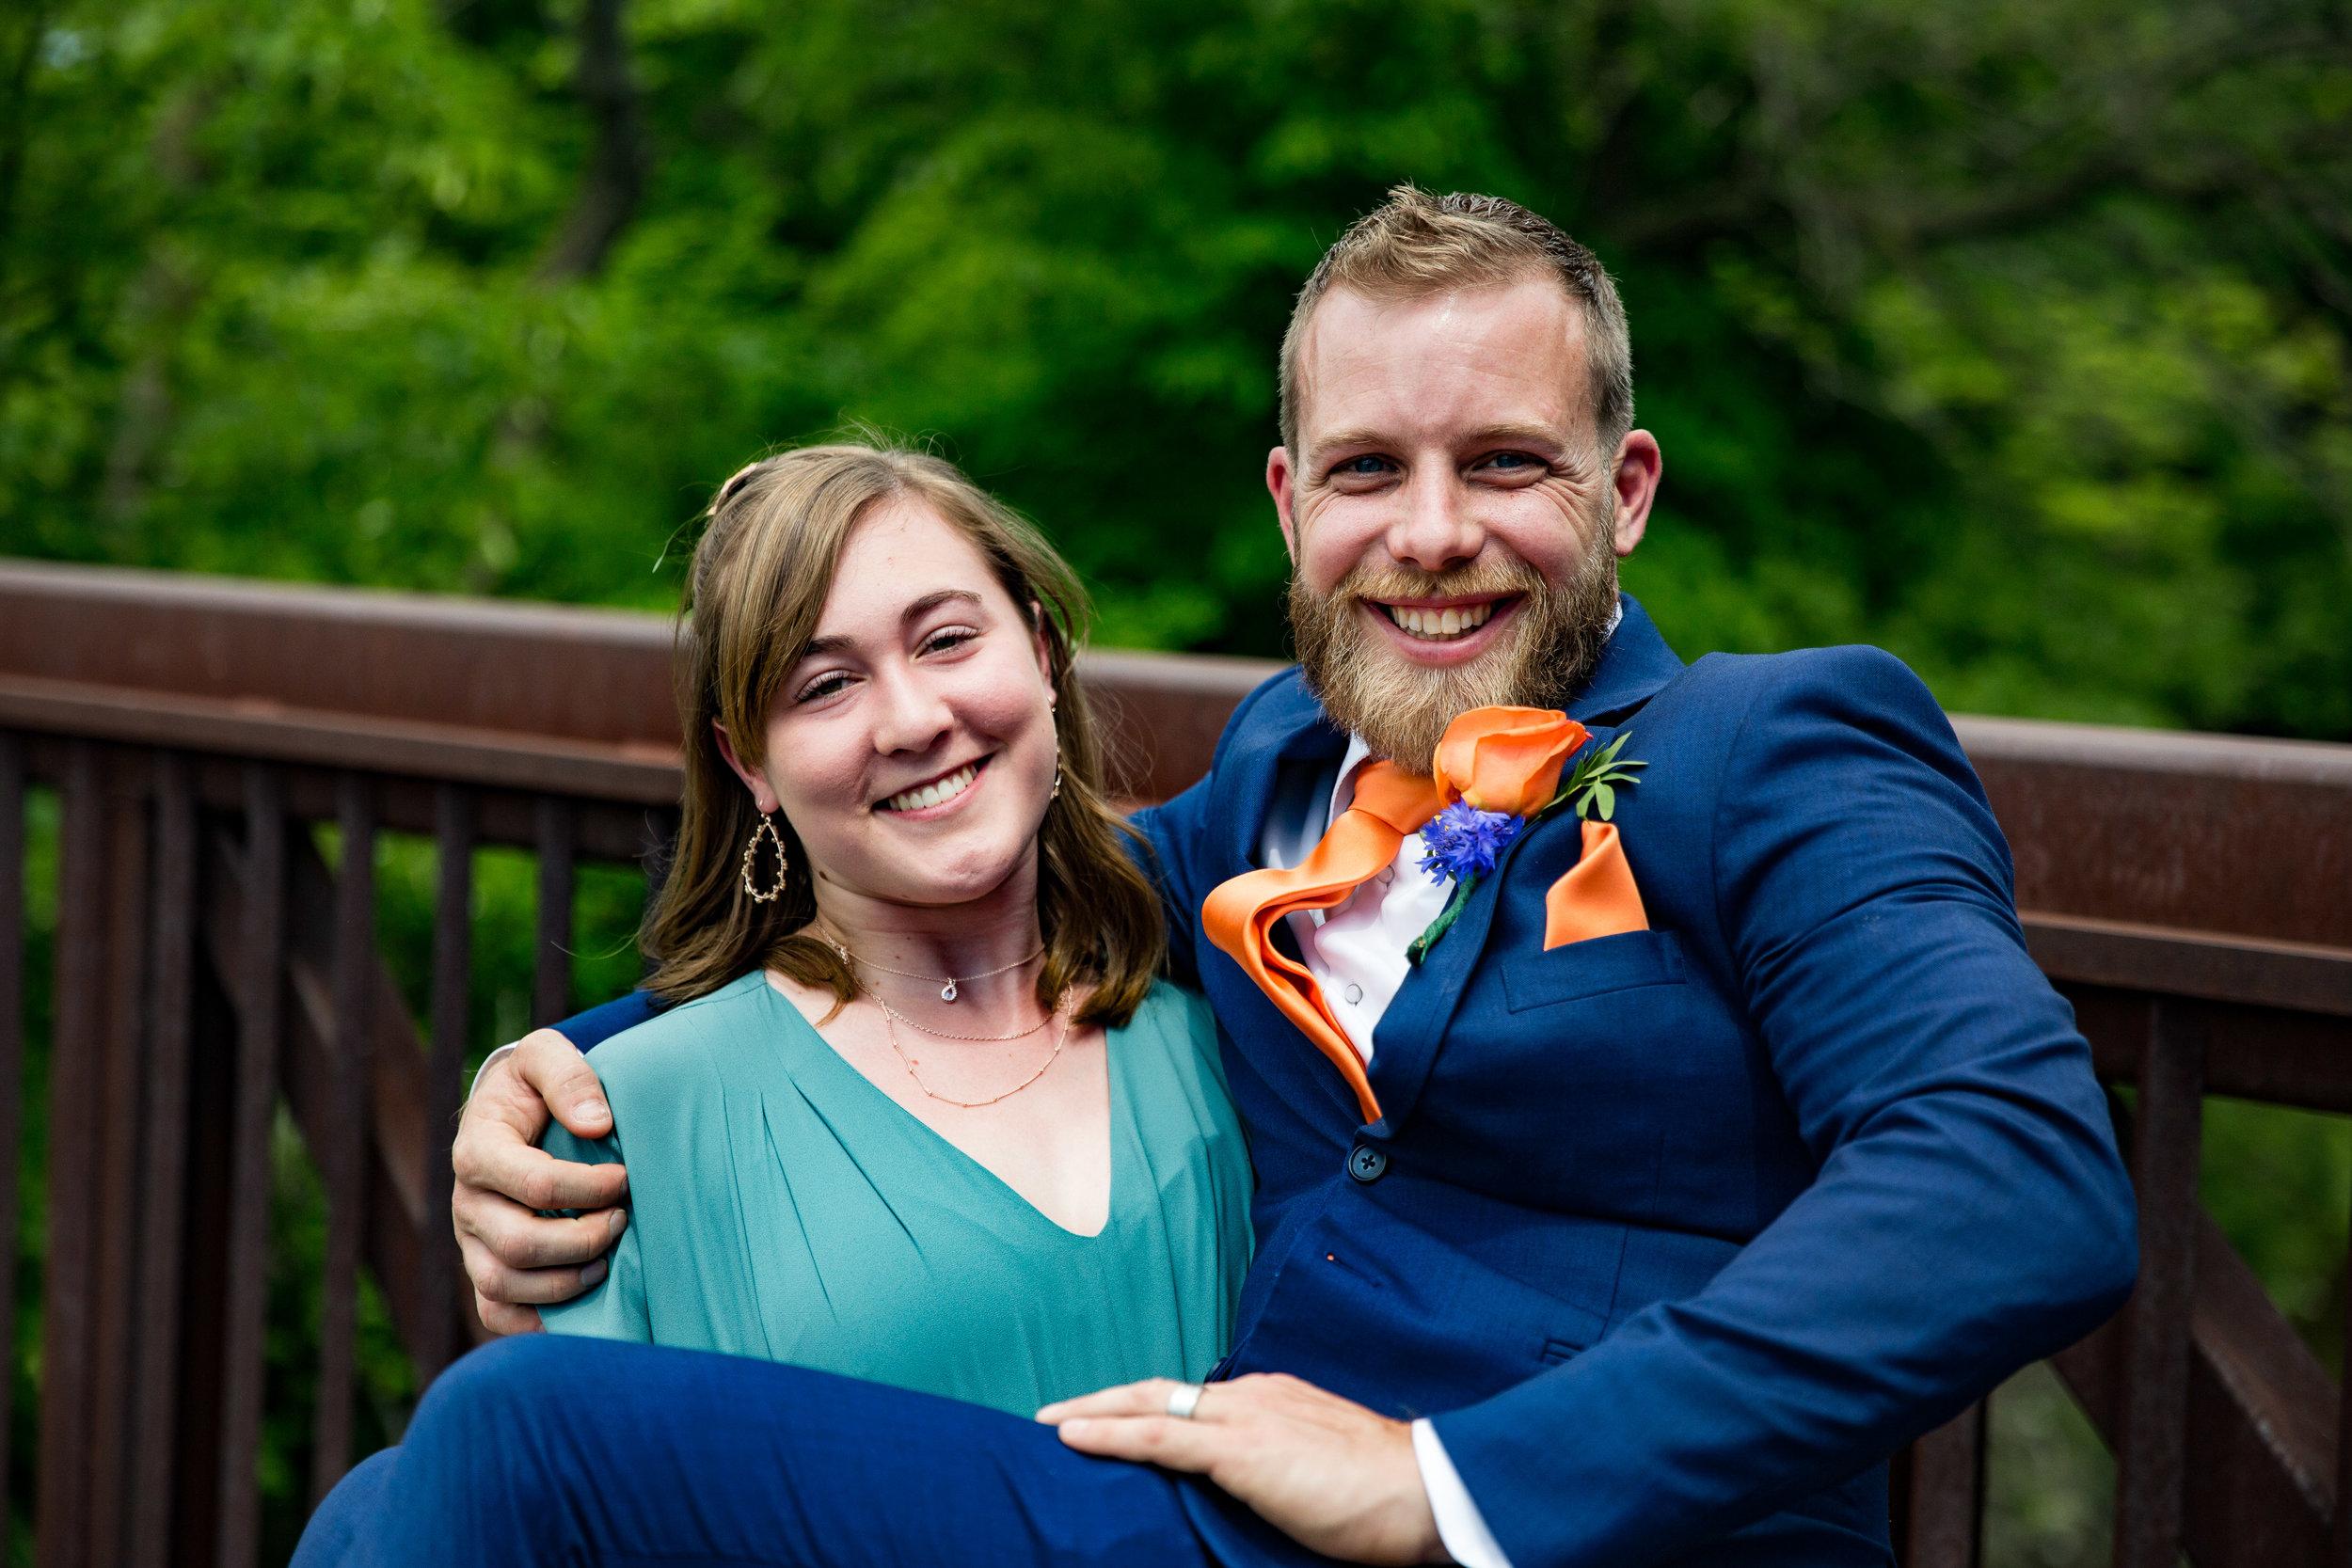 Natalie and Dallas Mooney Wedding 6-8-19_Tania Watt Photography-262.jpg